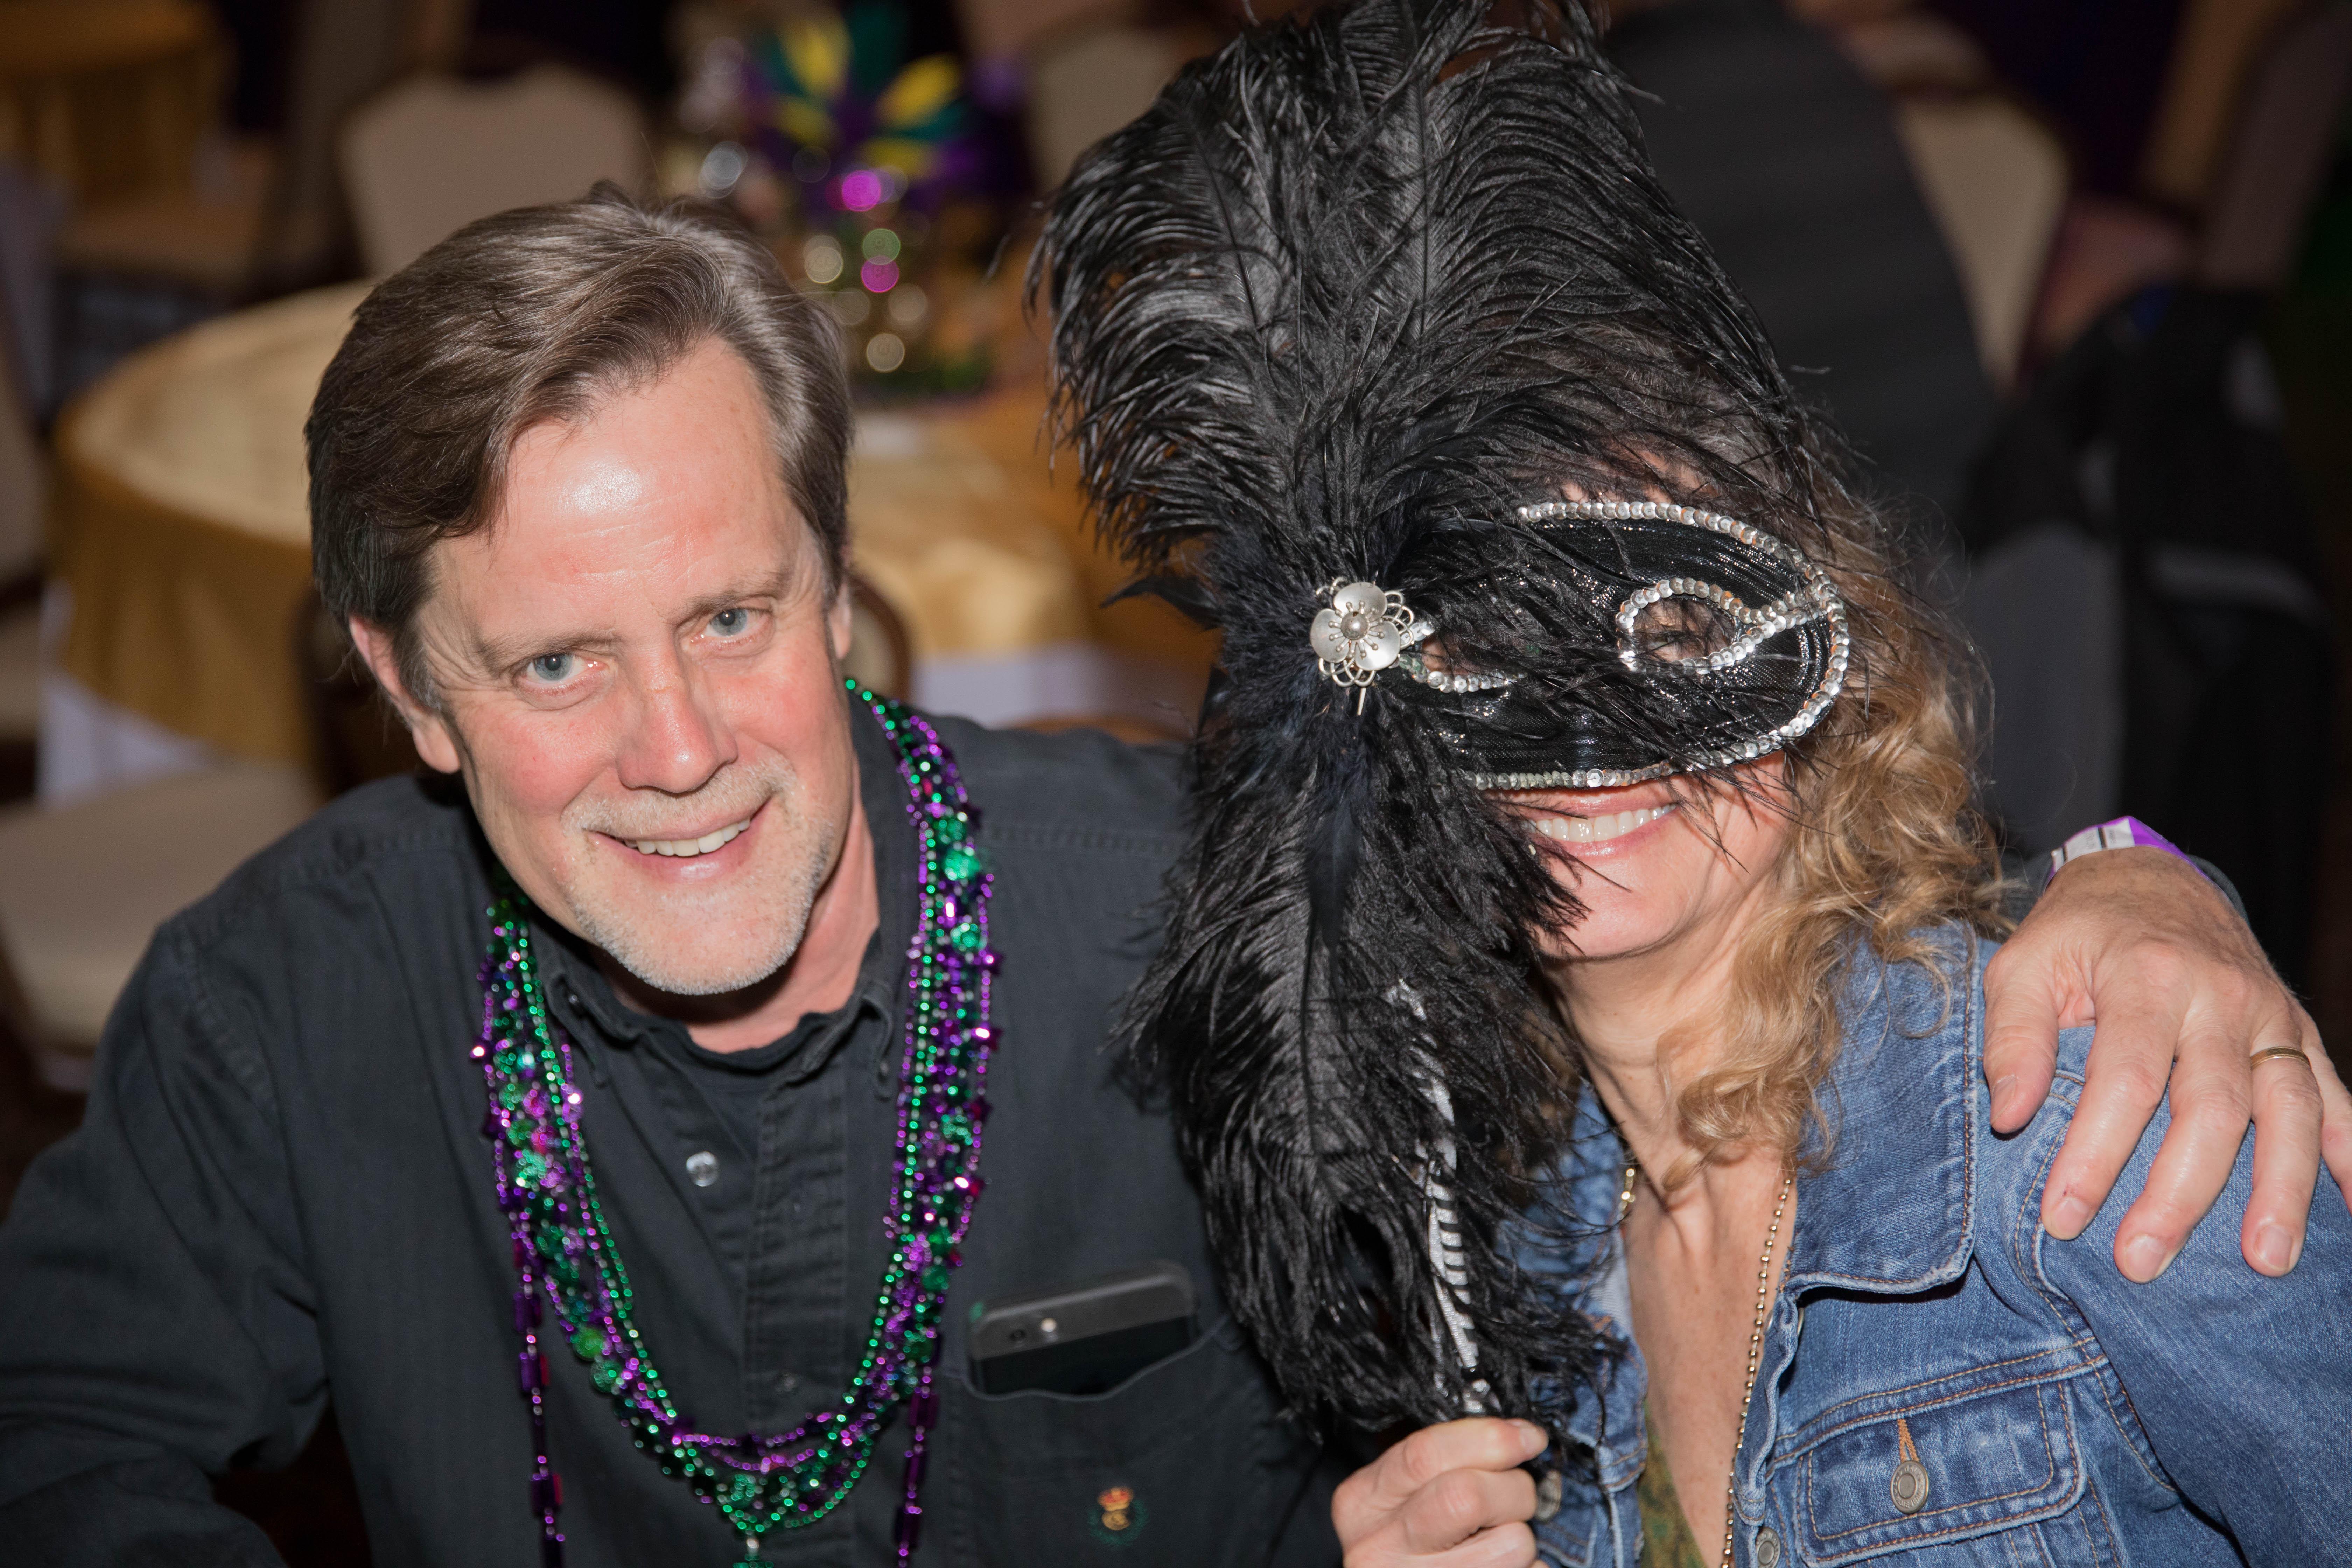 Mardi Gras Party '17